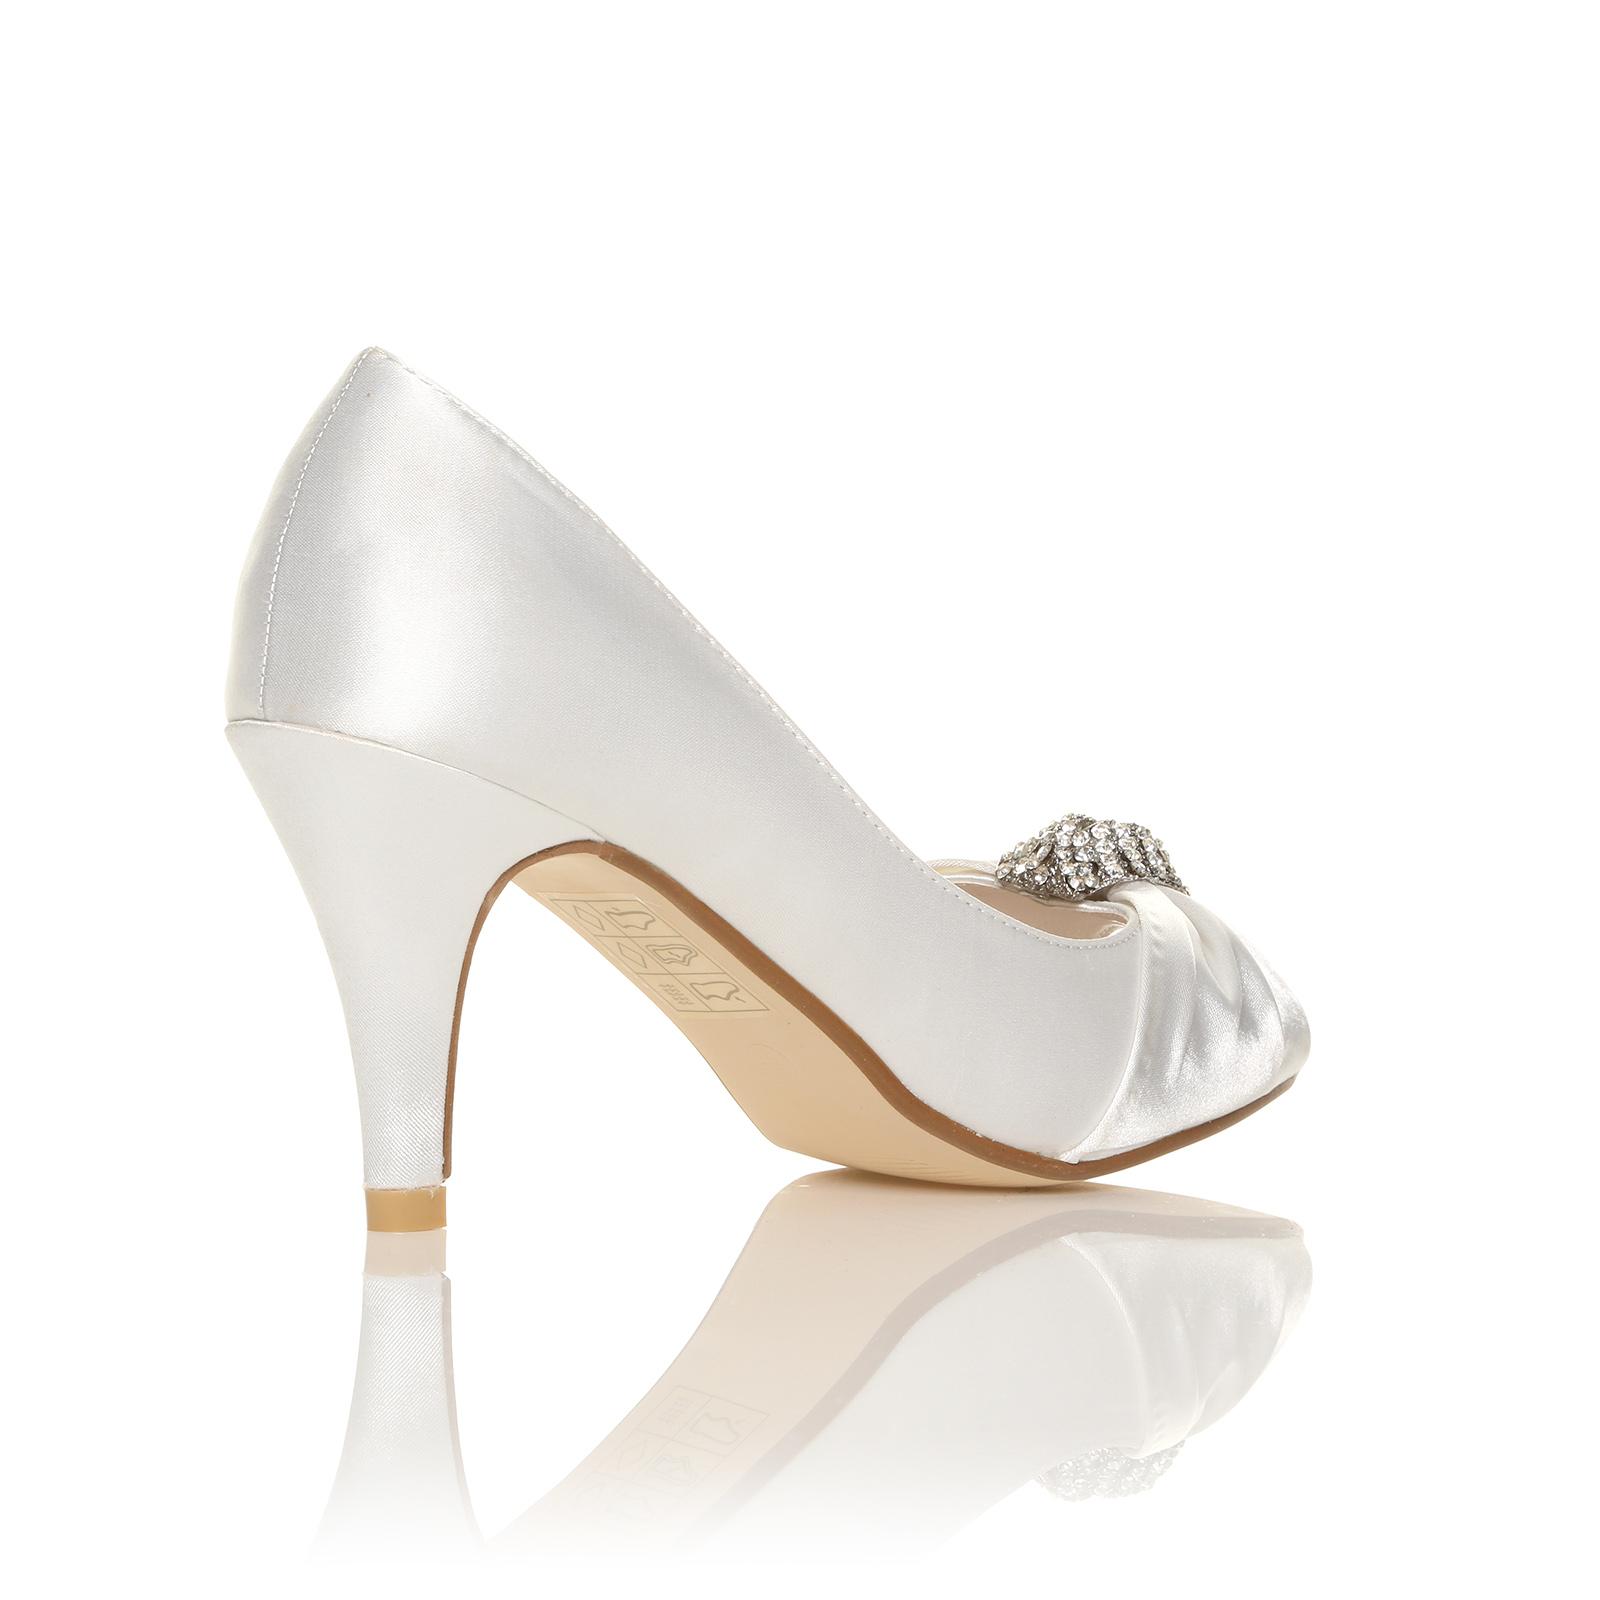 Ivory Wedding Shoes Low Heel Size